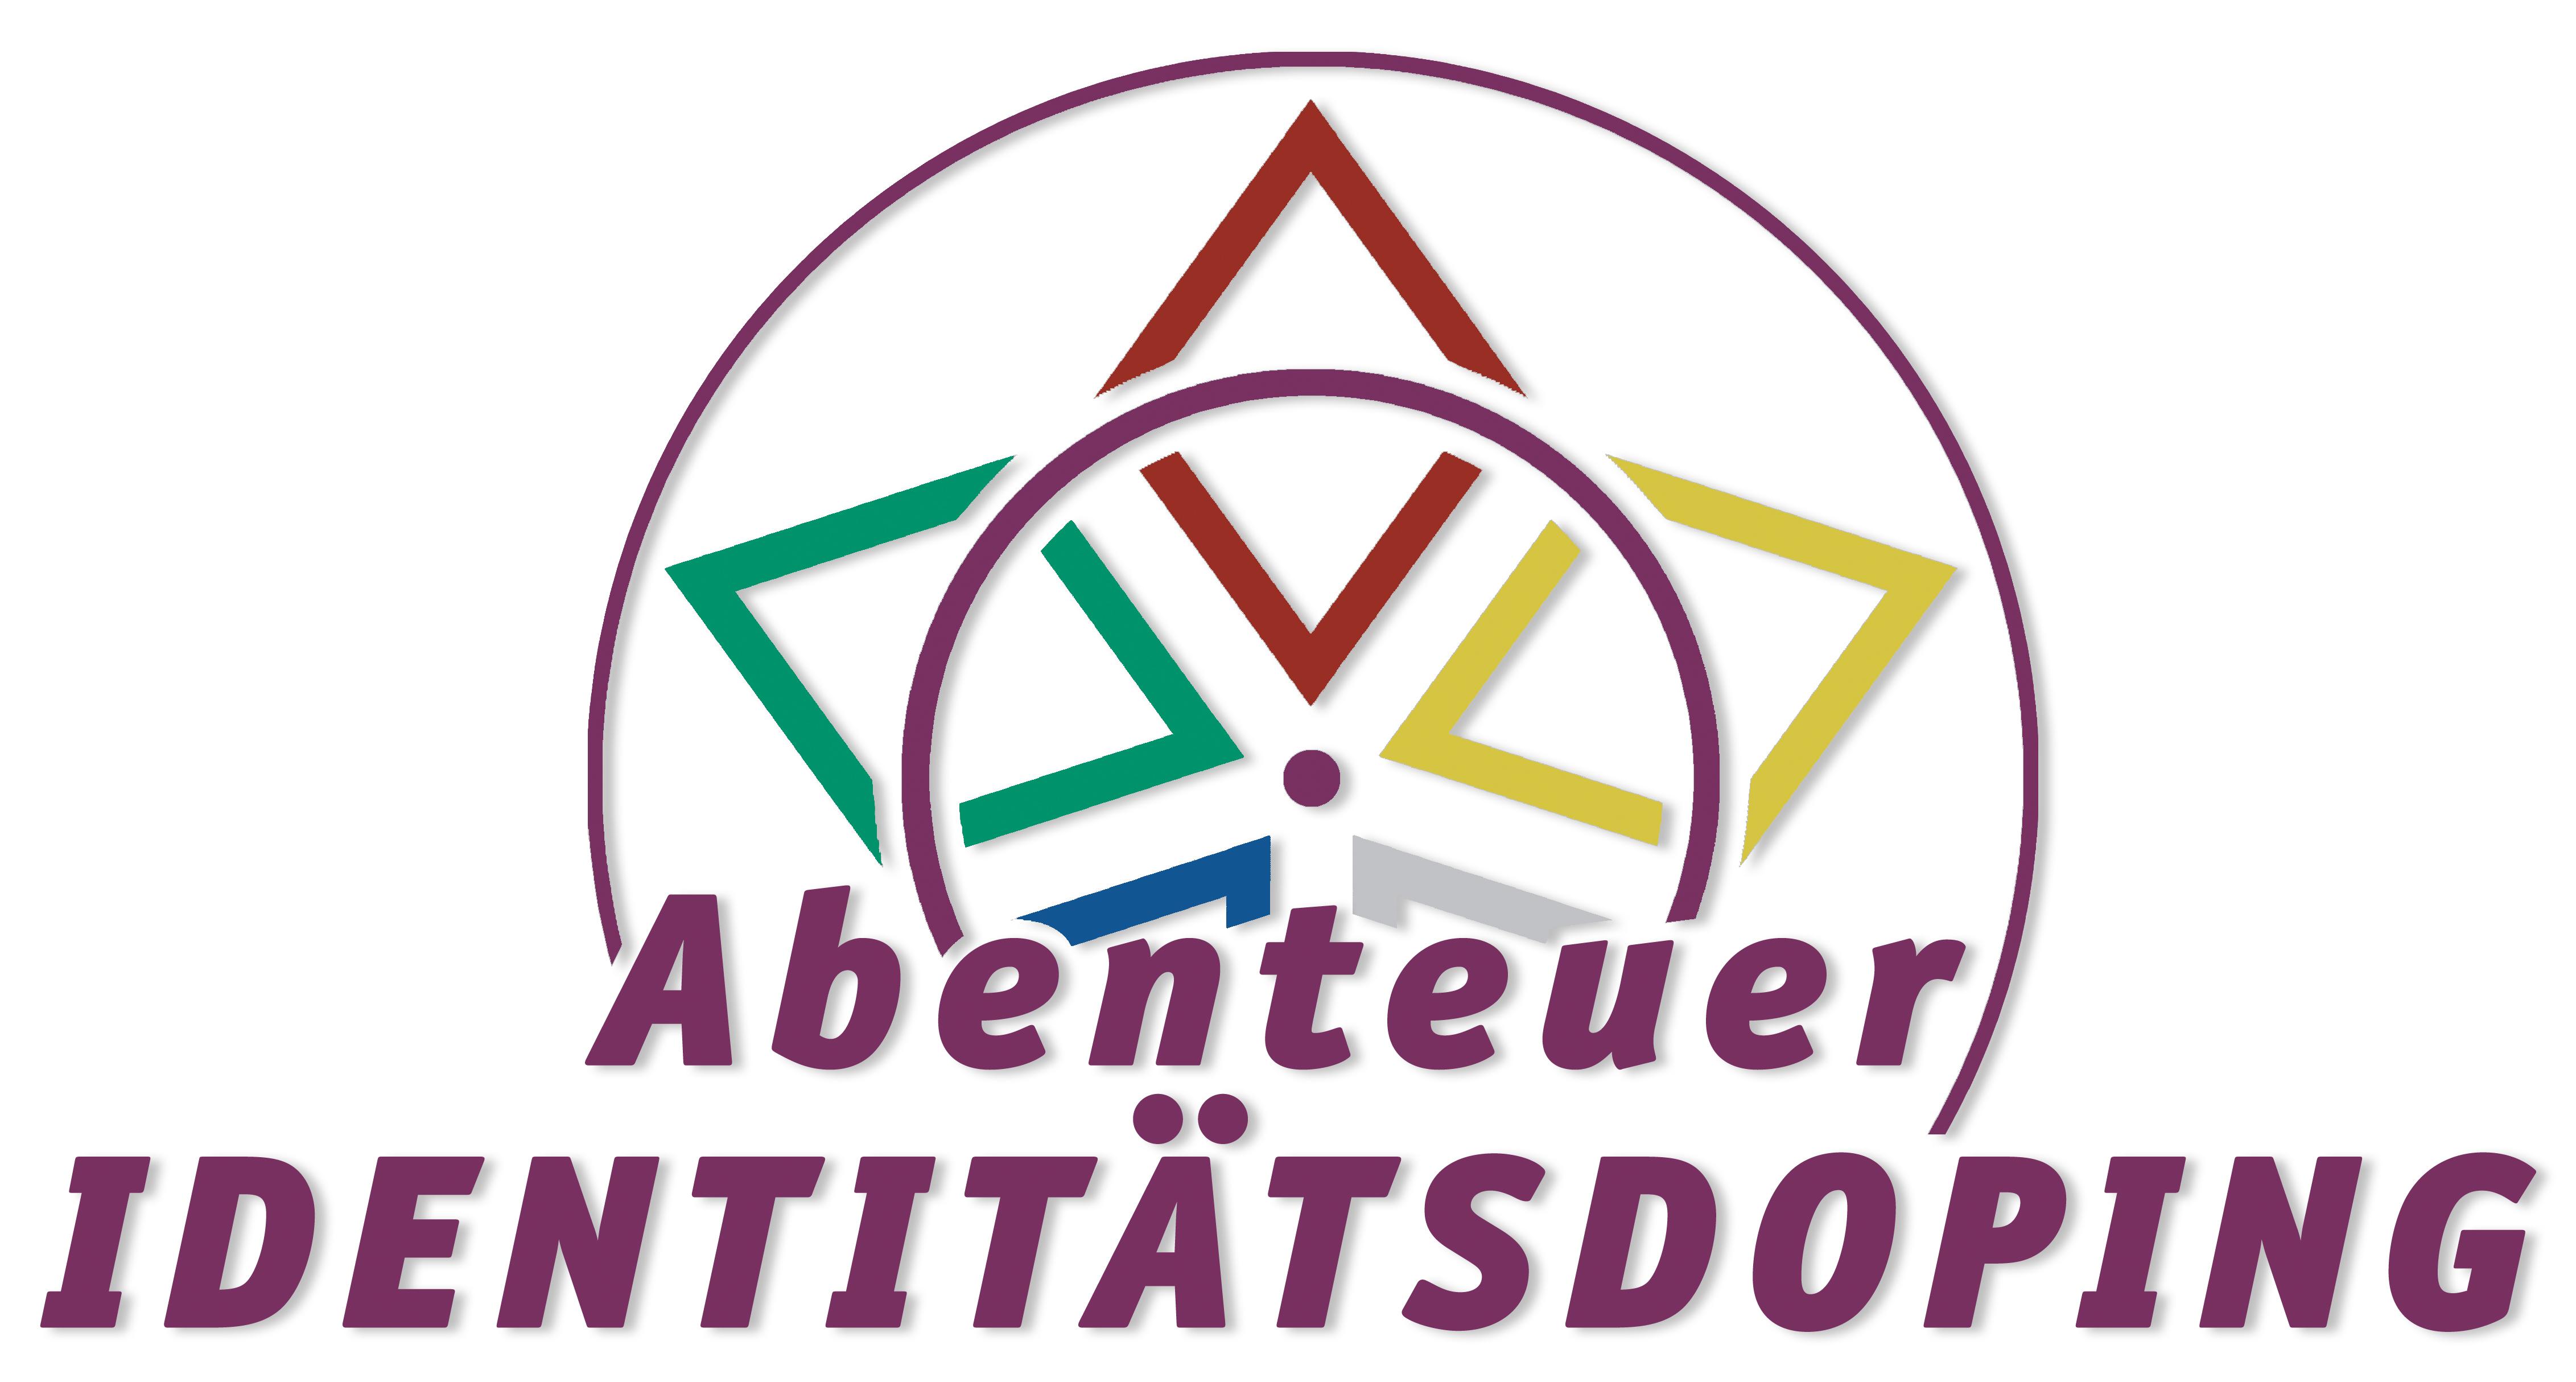 IDENTITAETSDOPING - ABENTEUER IDENTIITAETSDOPING - Logo - RGB